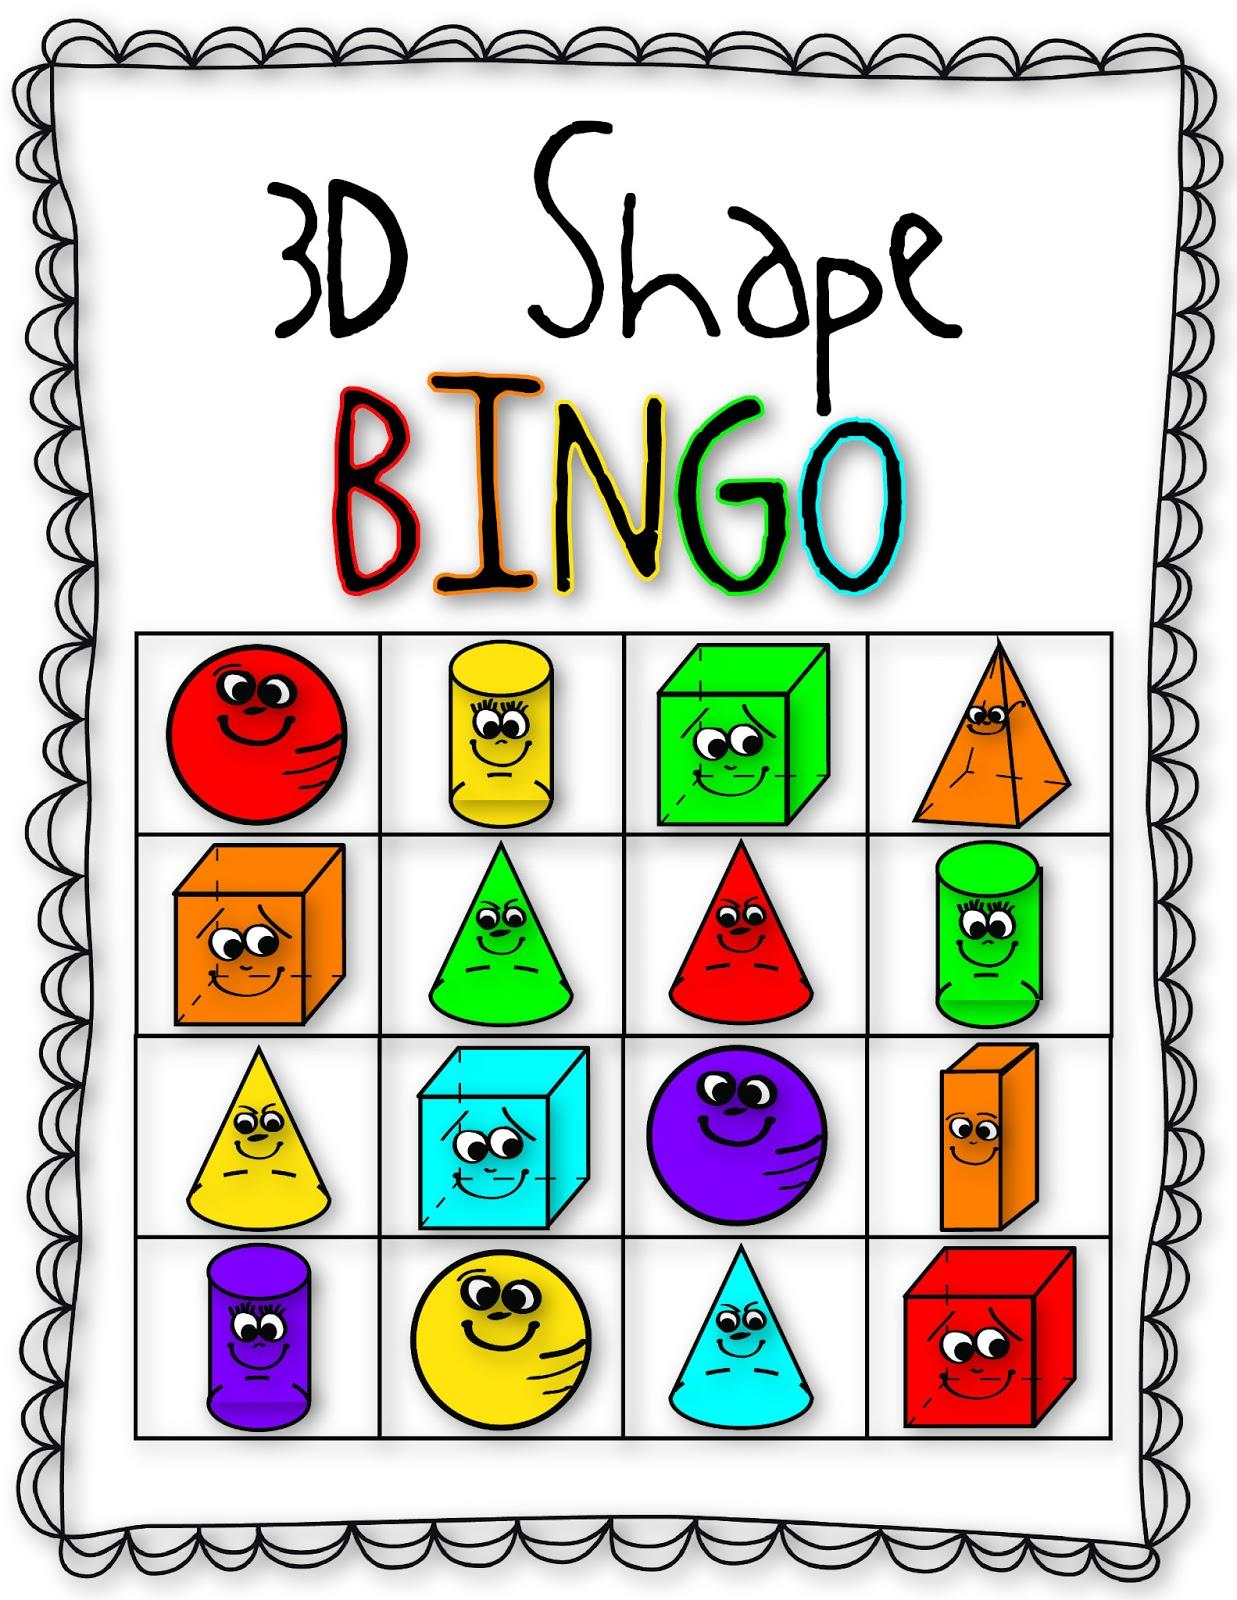 Bingo Night Clipart - Clipart Suggest